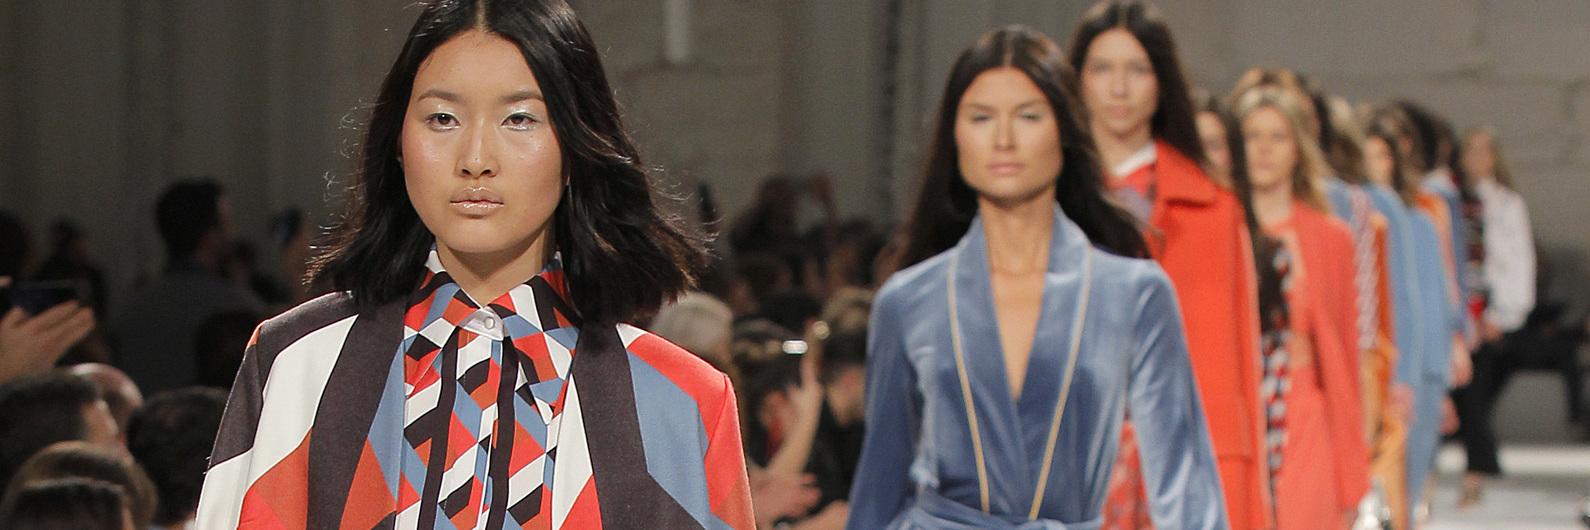 Carlos Gil encerra 3º dia de Portugal Fashion de forma sublime